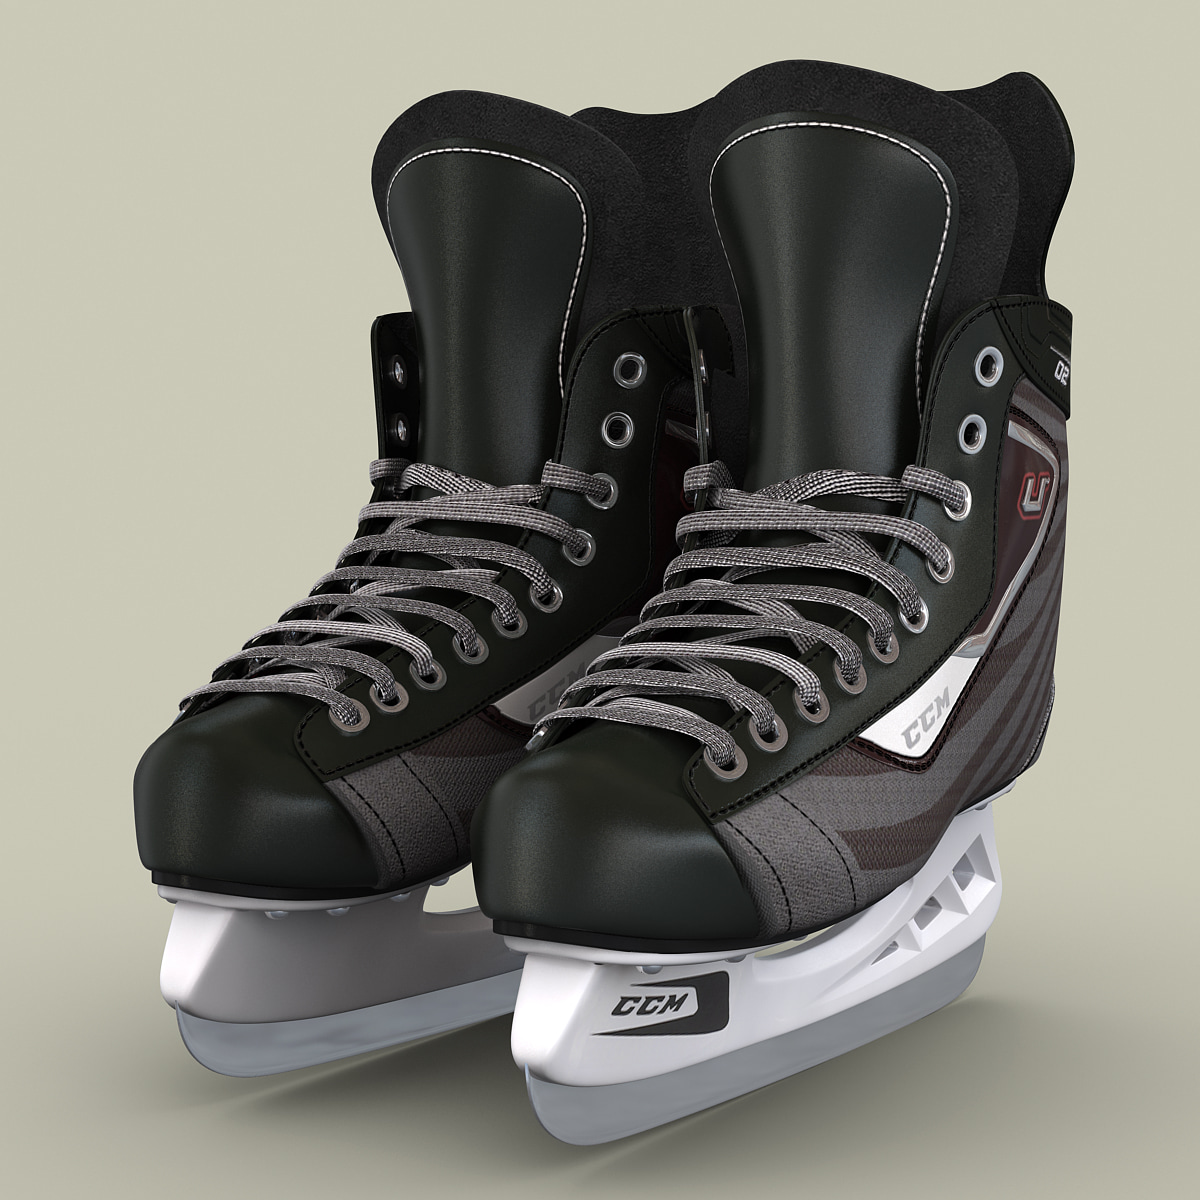 ice hockey skates ccm lwo